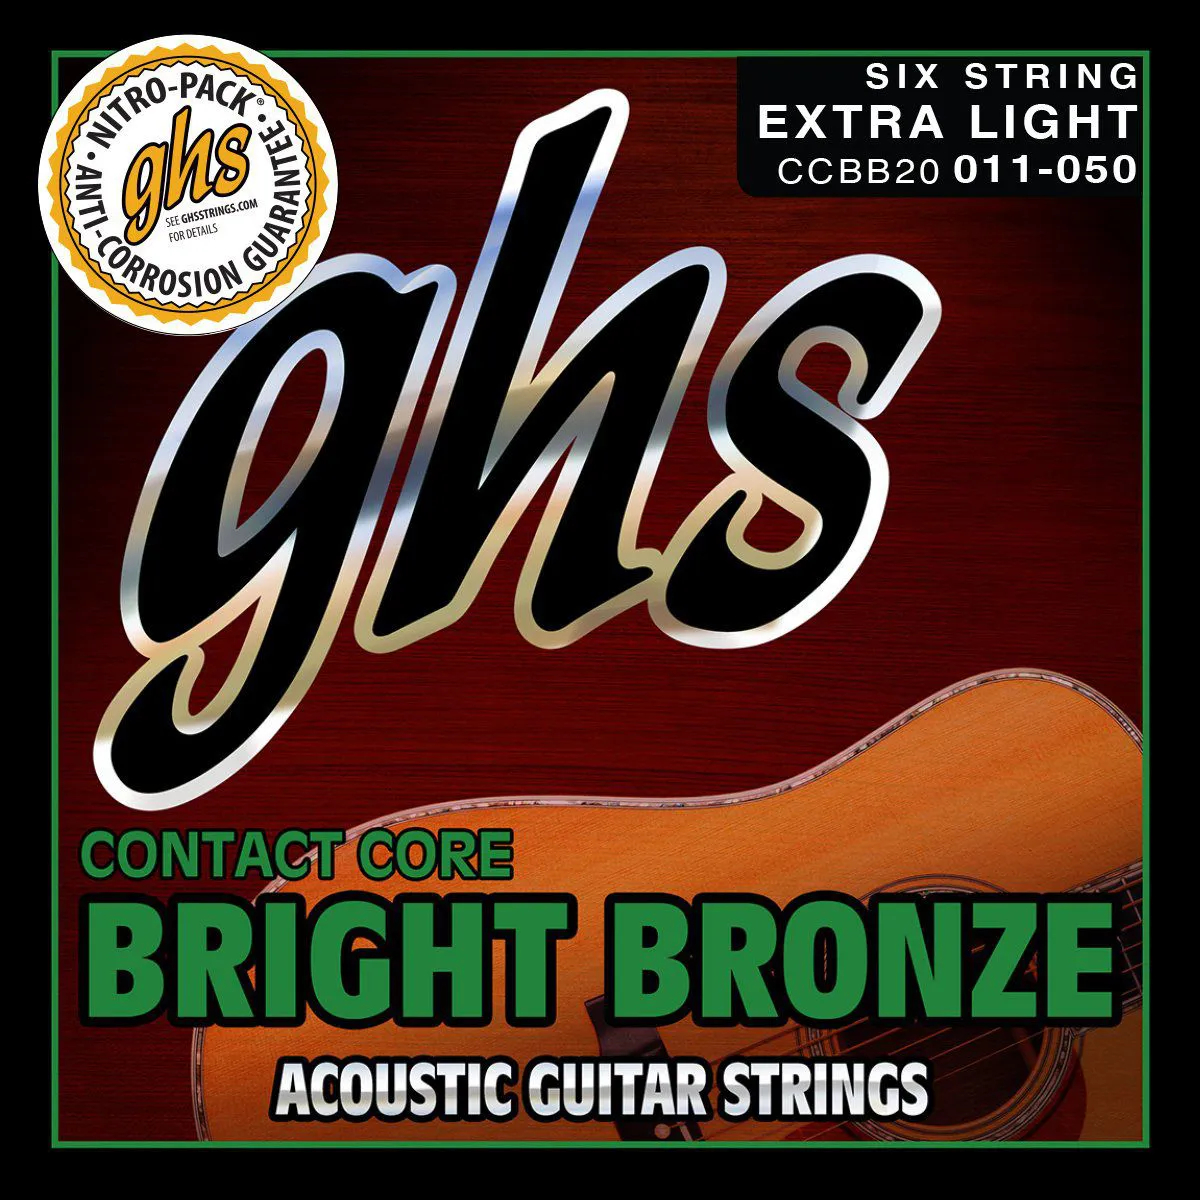 CCBB10 - ENC VIOLAO ACO CONTACT CORE BRIGHT BRONZE 010/046 - GHS